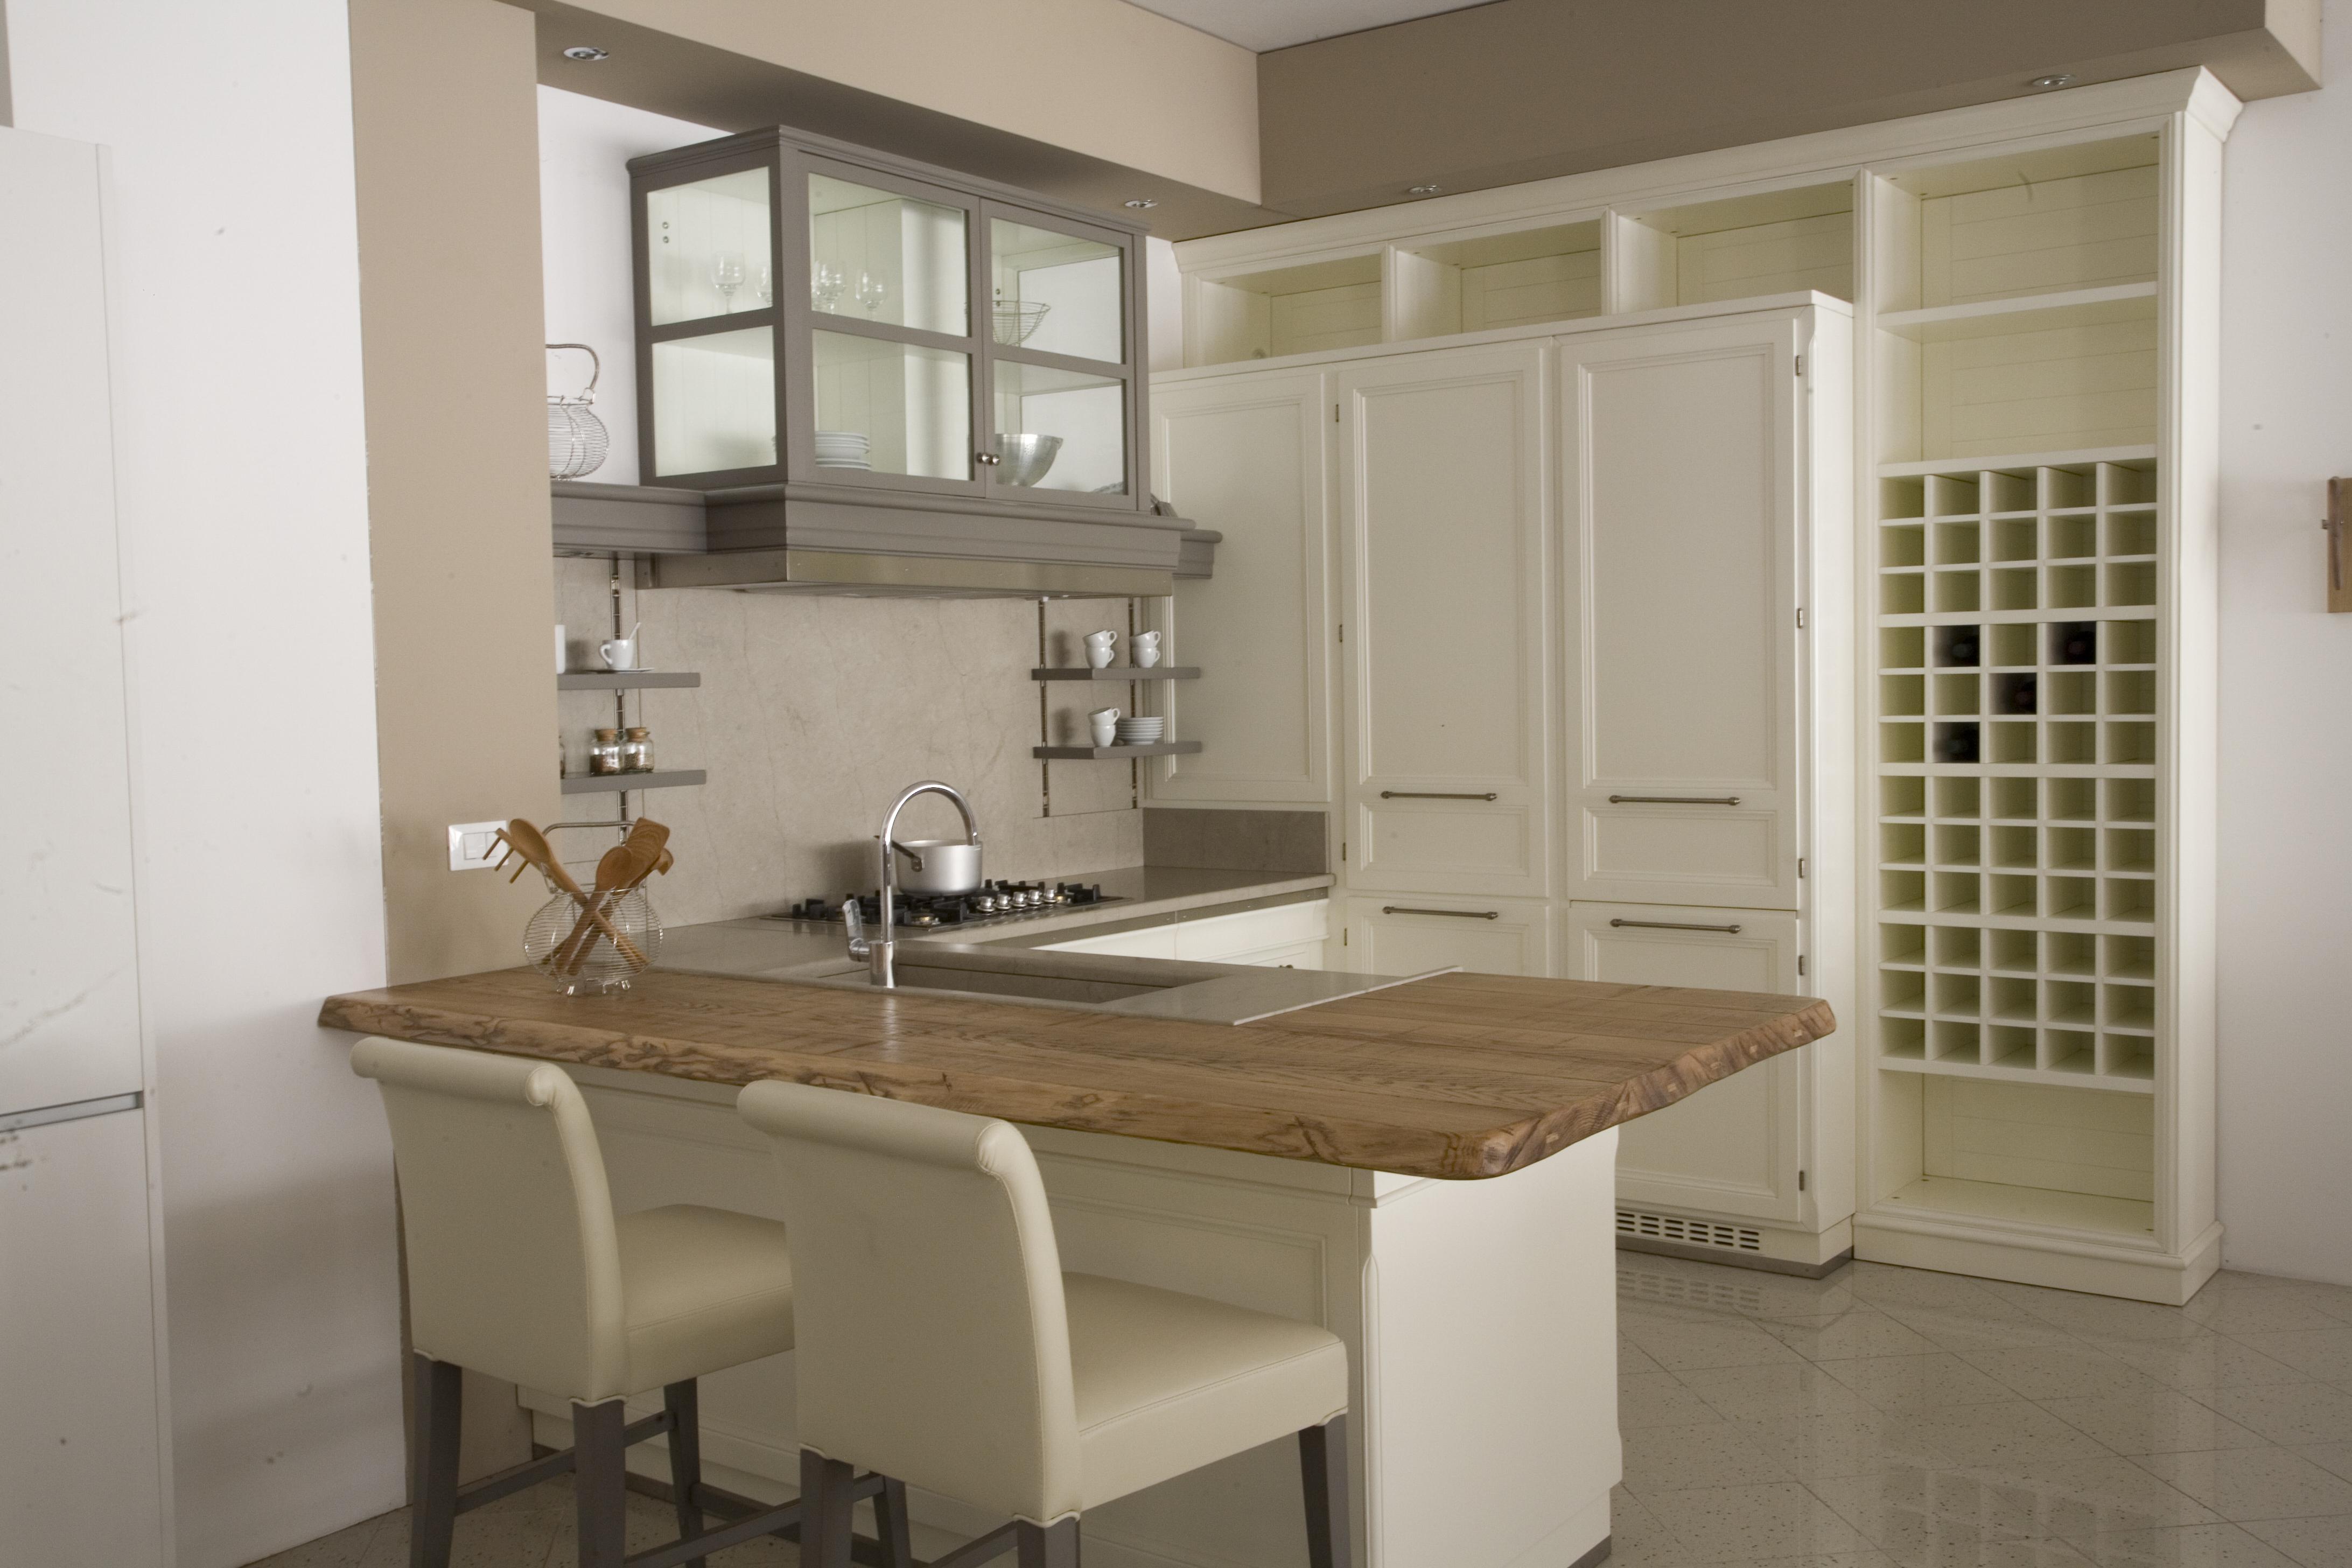 Stunning cucina con bancone snack images home interior ideas - Cucina con bancone ...